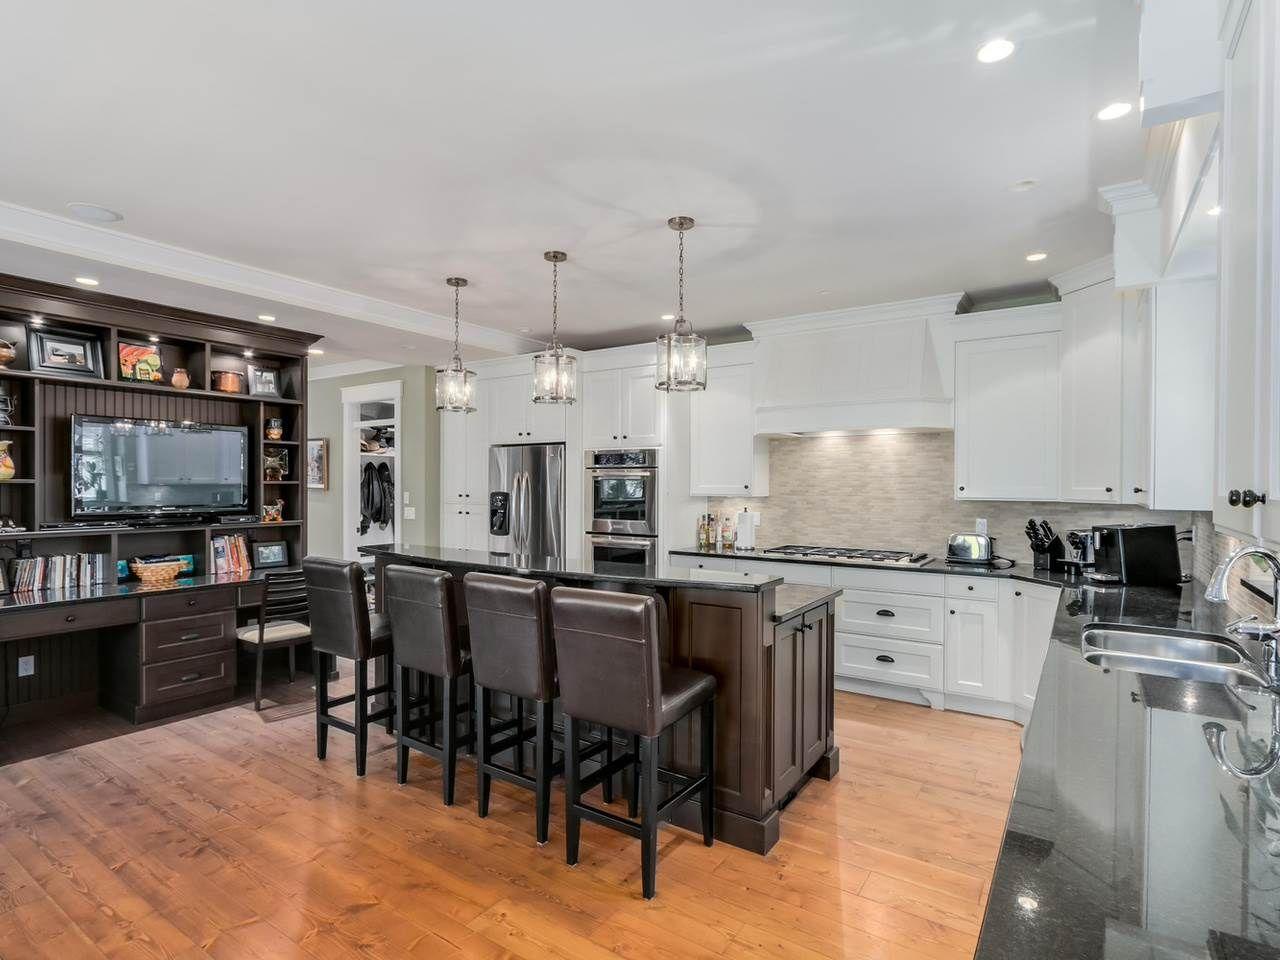 Photo 6: Photos: 13029 14 Avenue in Surrey: Crescent Bch Ocean Pk. House for sale (South Surrey White Rock)  : MLS®# R2070160